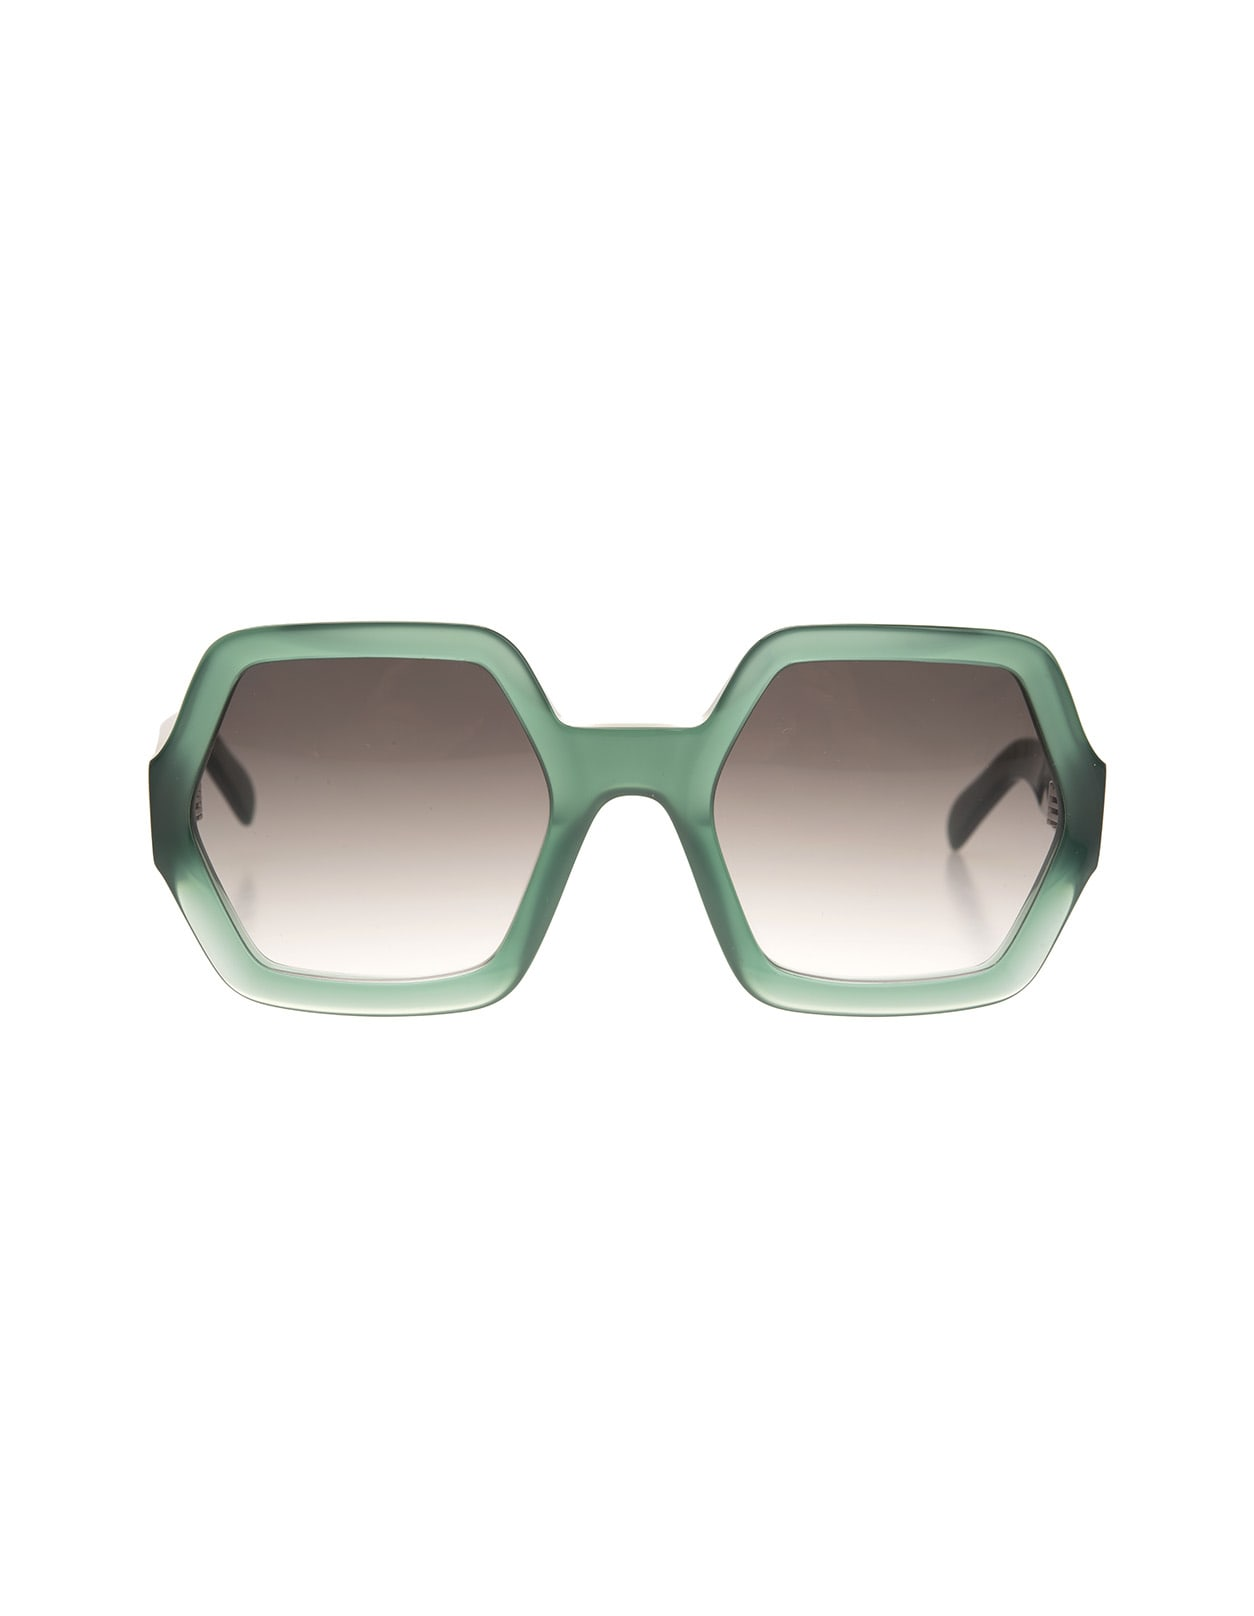 Green Oversize Sunglasses